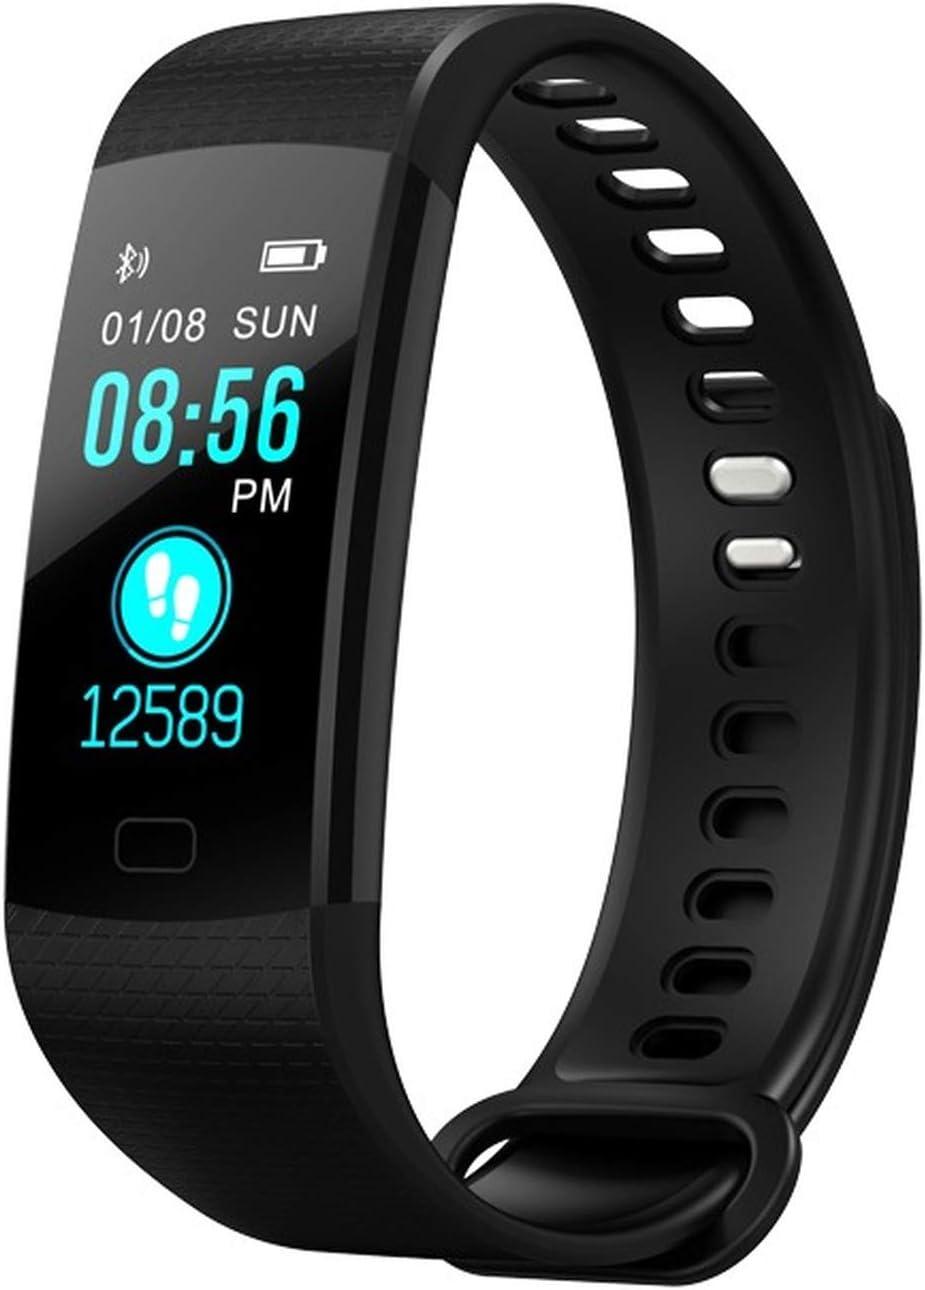 NINGX USB Smart Light Screen Popular Elegant shop is the lowest price challenge Bracelet Tracker Sports Blo Fitness